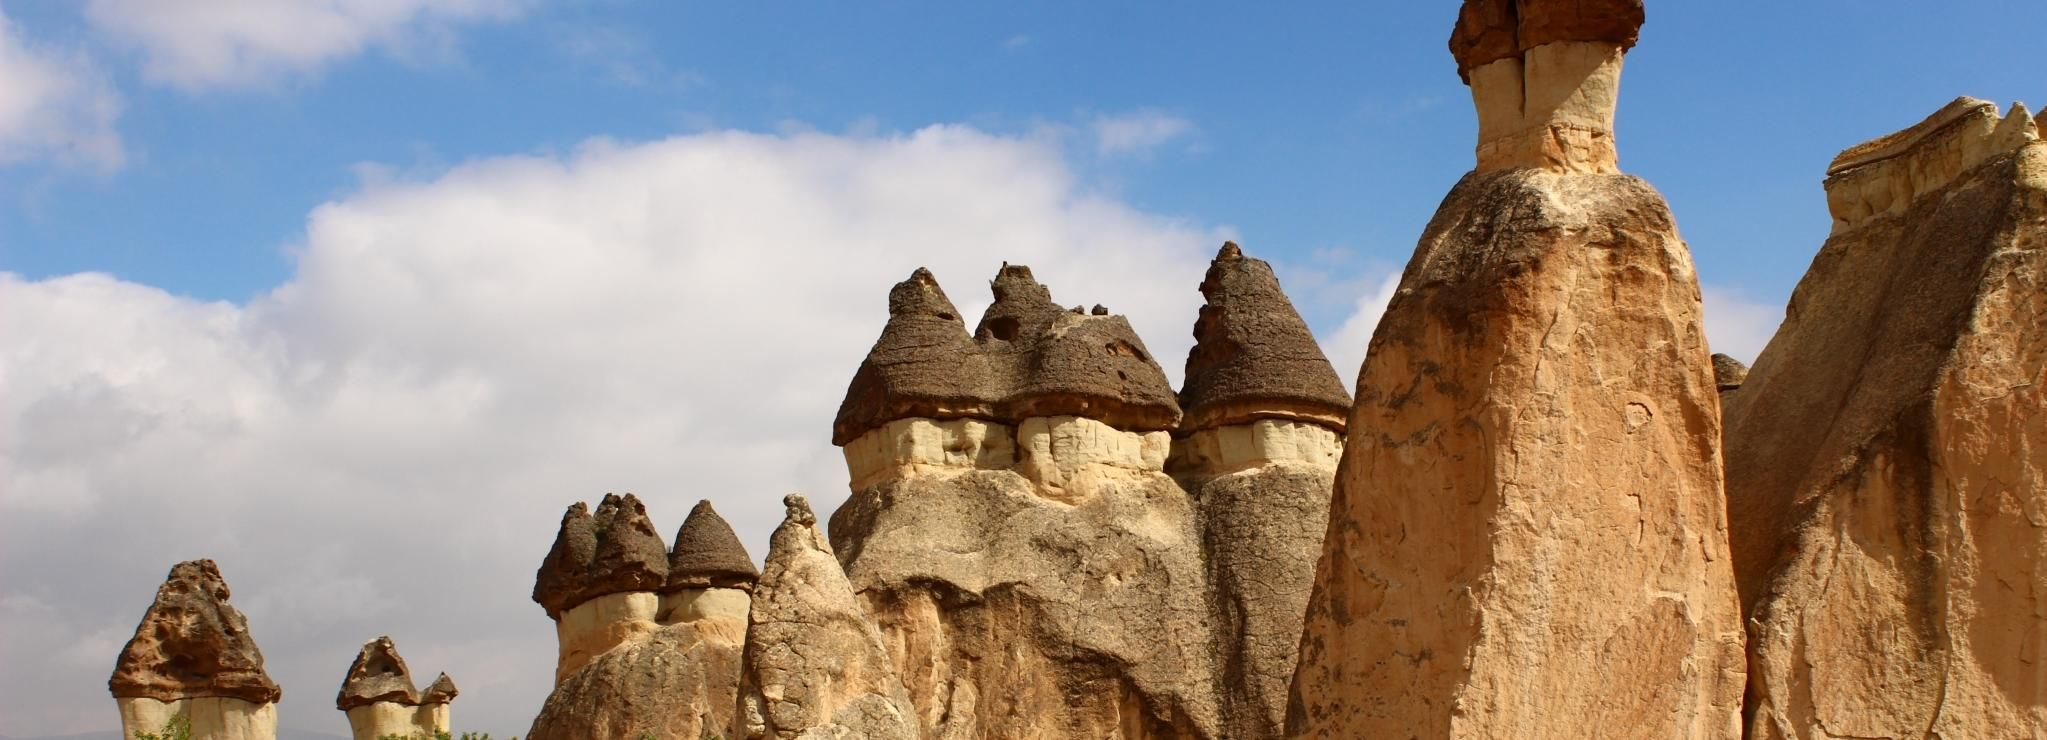 North Cappadocia Fairychimneys and Open Air Museum Tour